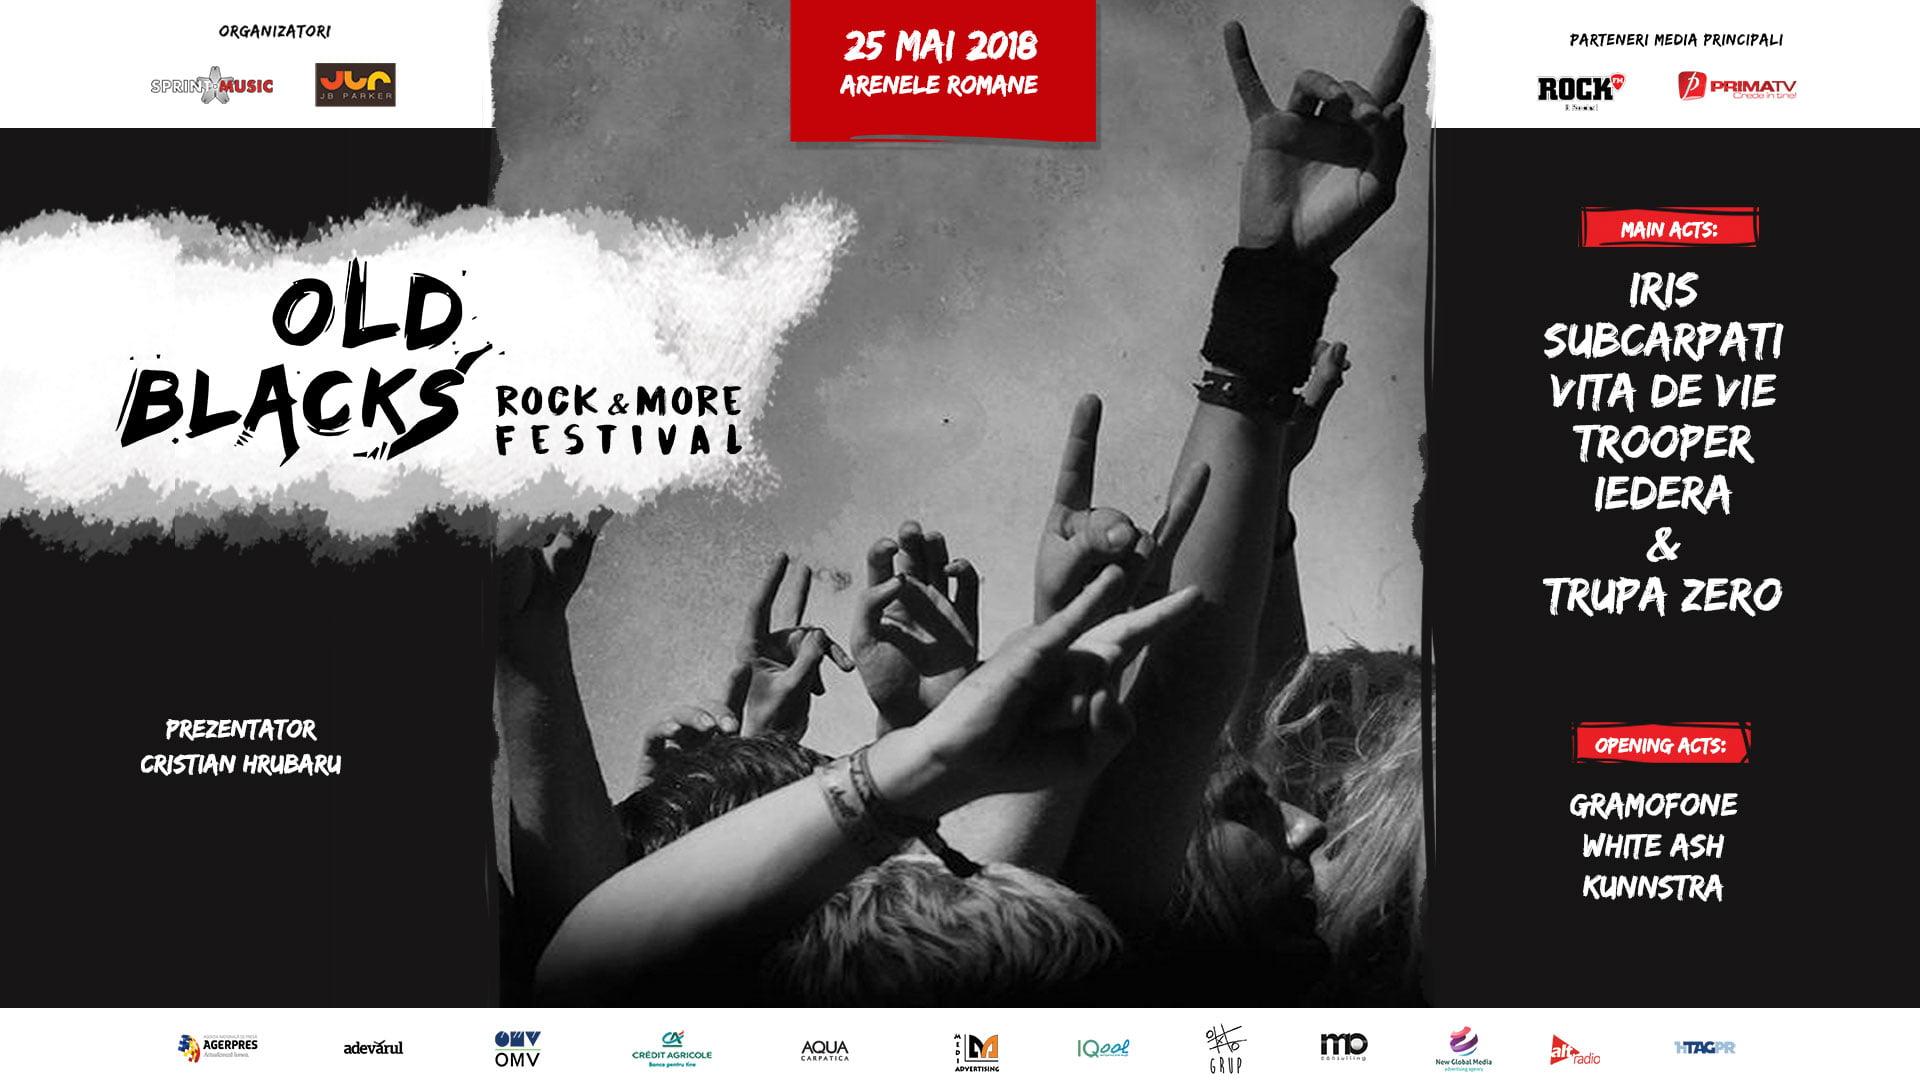 REGULI DE ACCES @OLD BLACKS, ROCK & MORE FESTIVAL